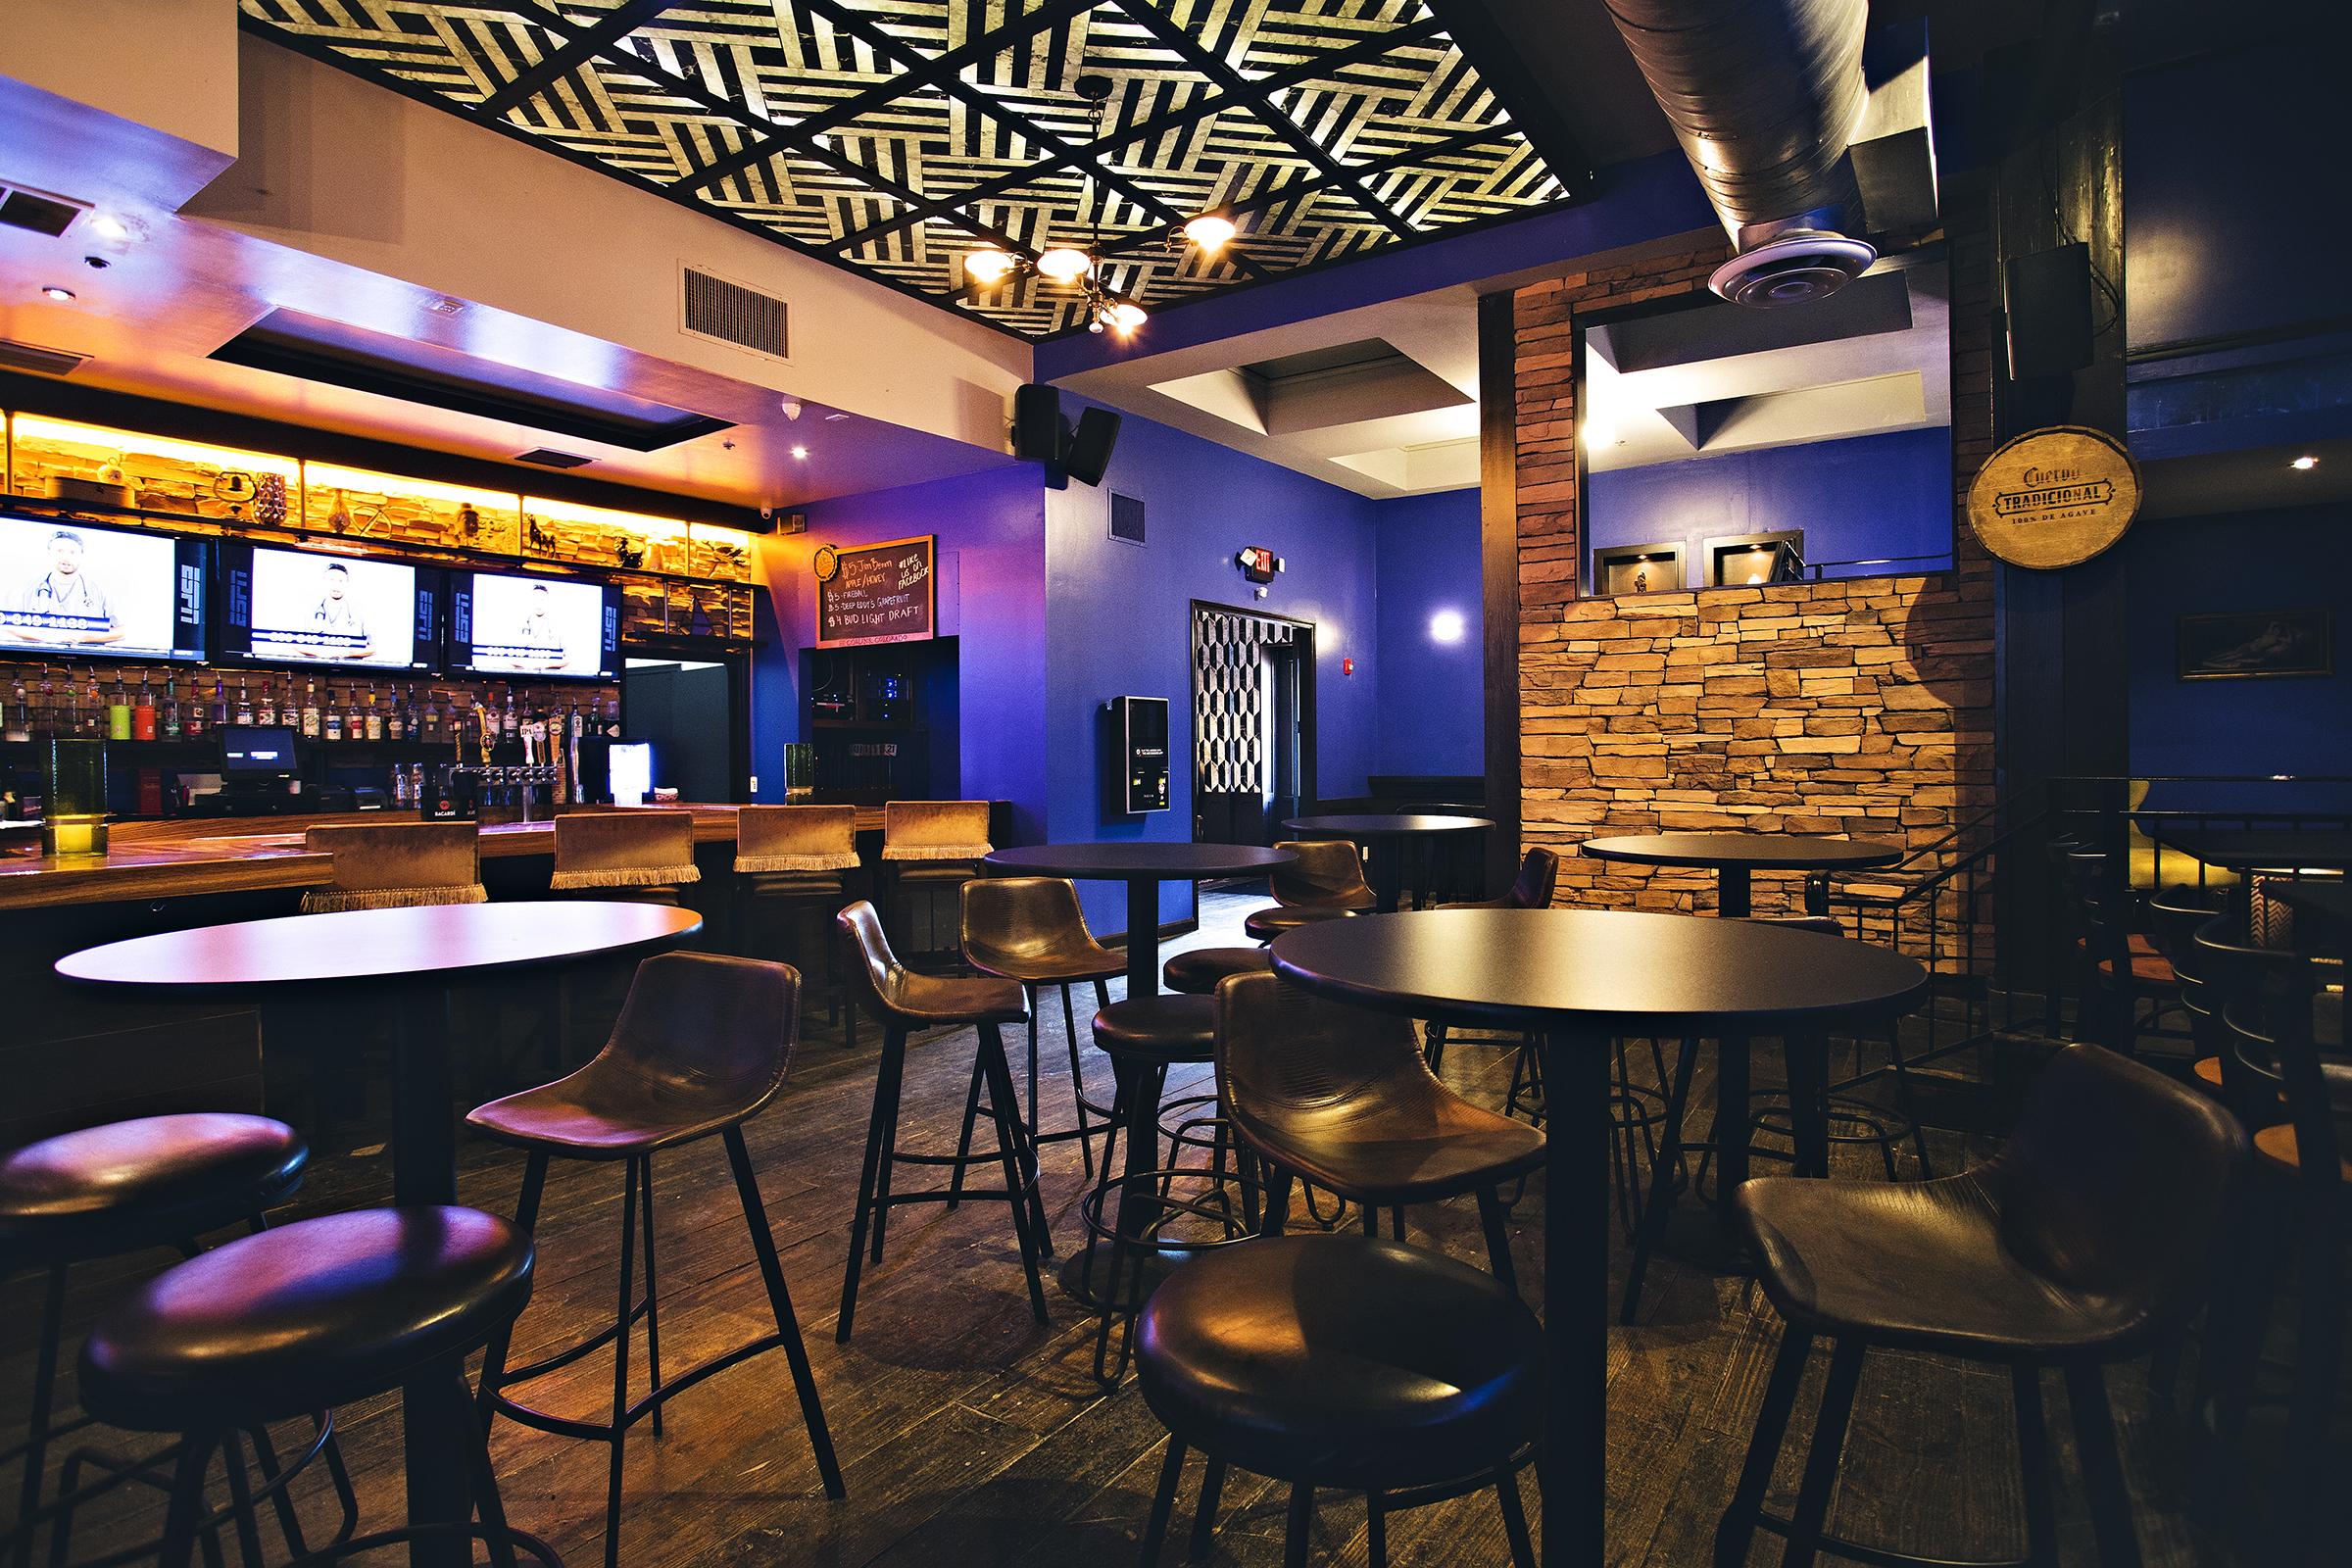 luxury gastro pub houston texas 77007.jpg